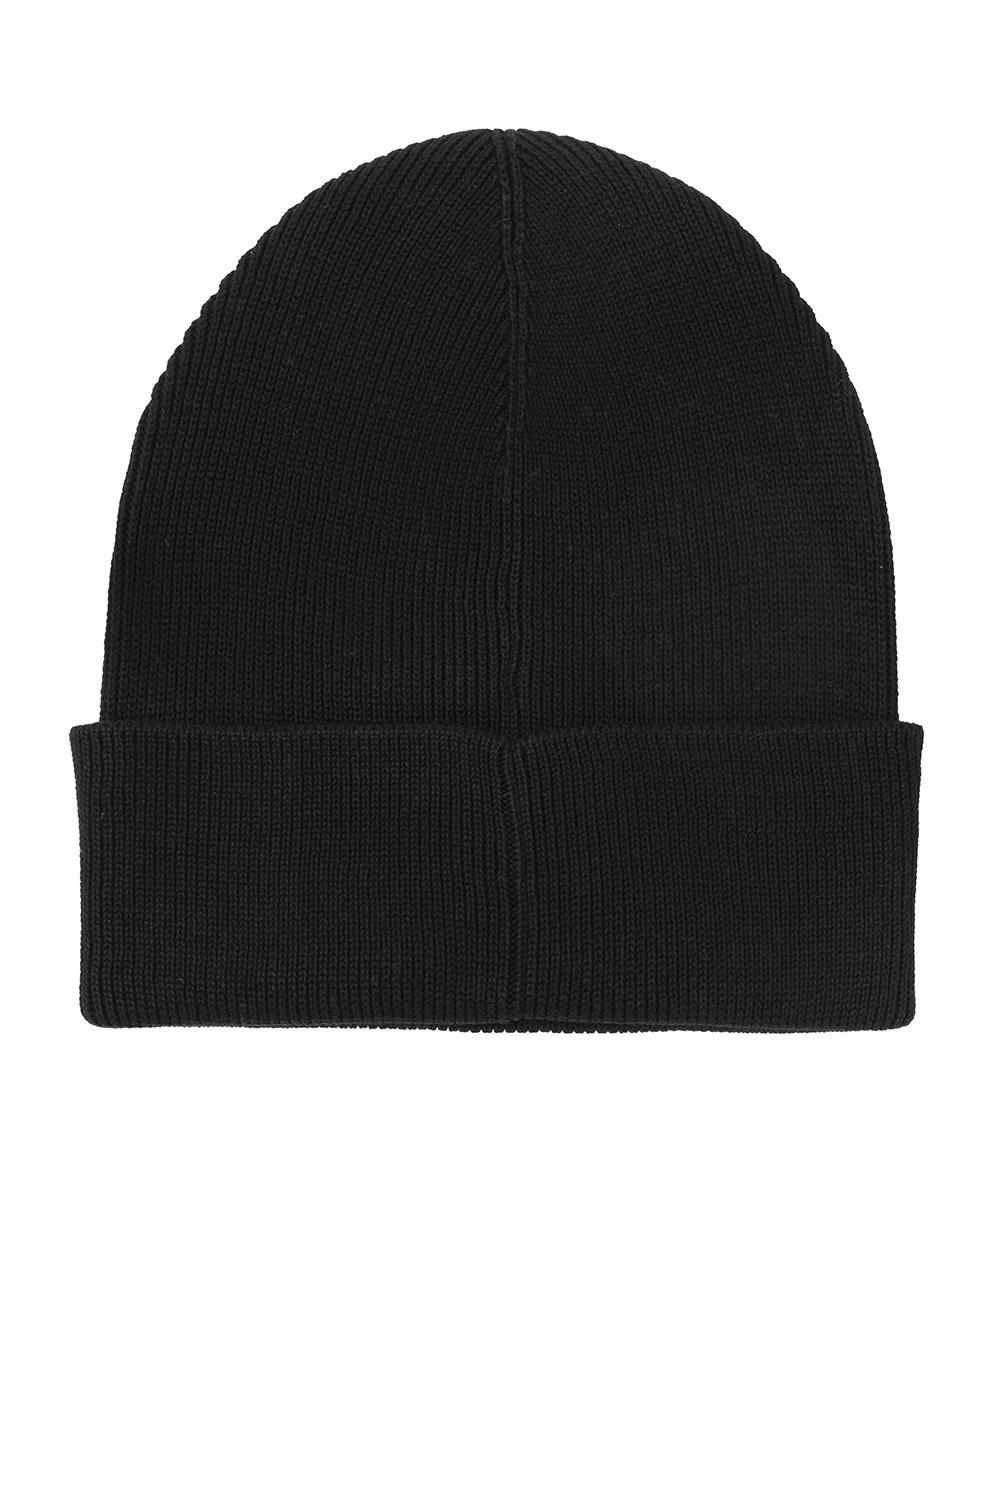 Givenchy Appliquéd hat